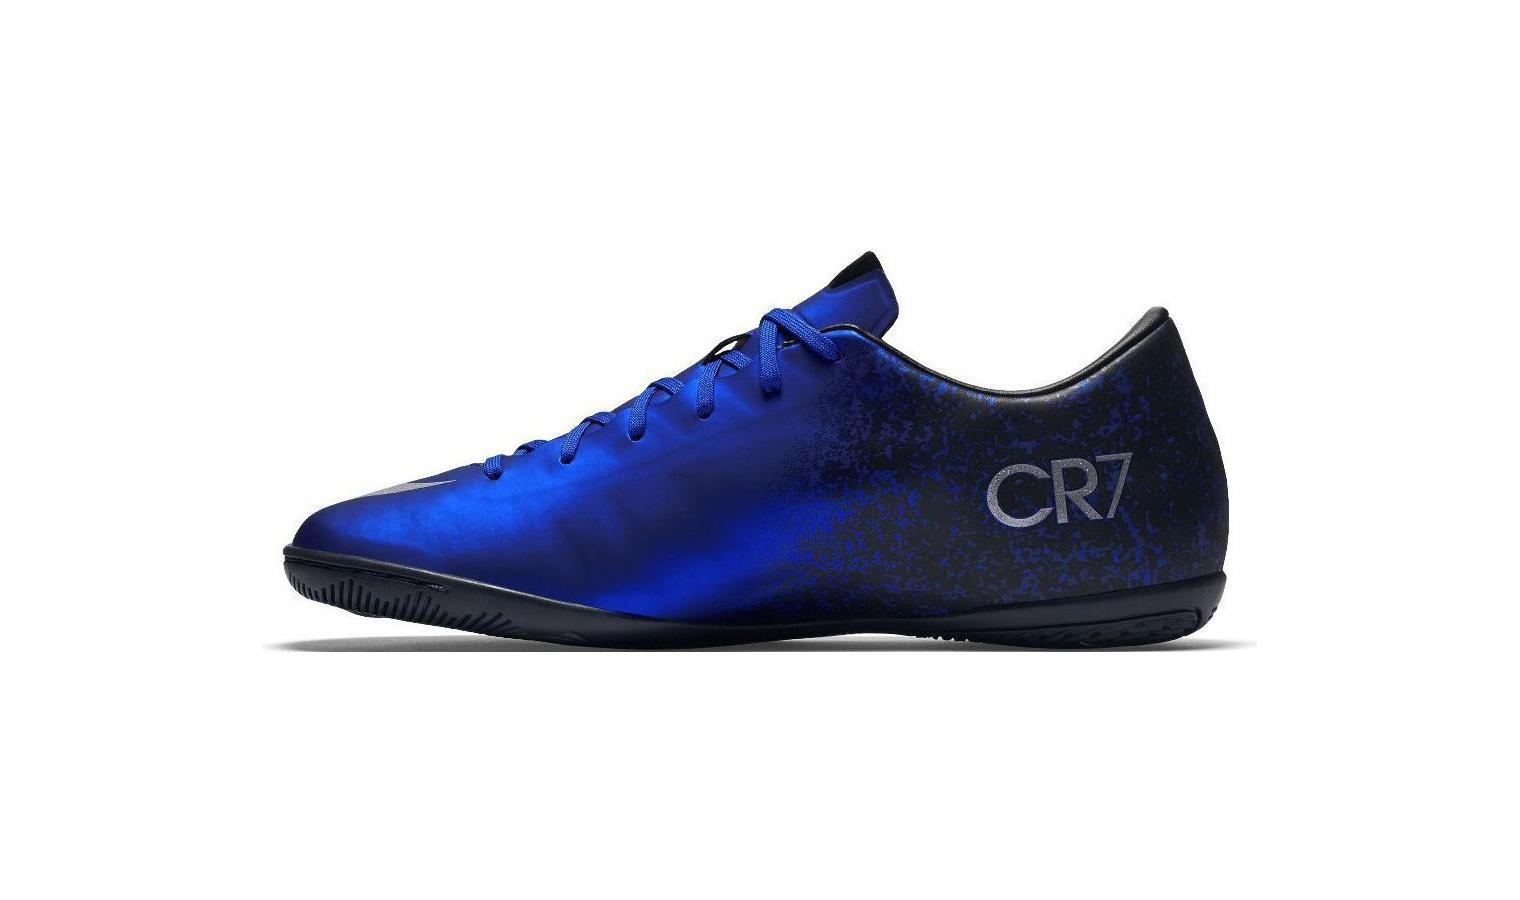 aff1fd0ec9b06 Halovky Nike MERCURIAL VICTORY V CR IC modré | AD Sport.sk